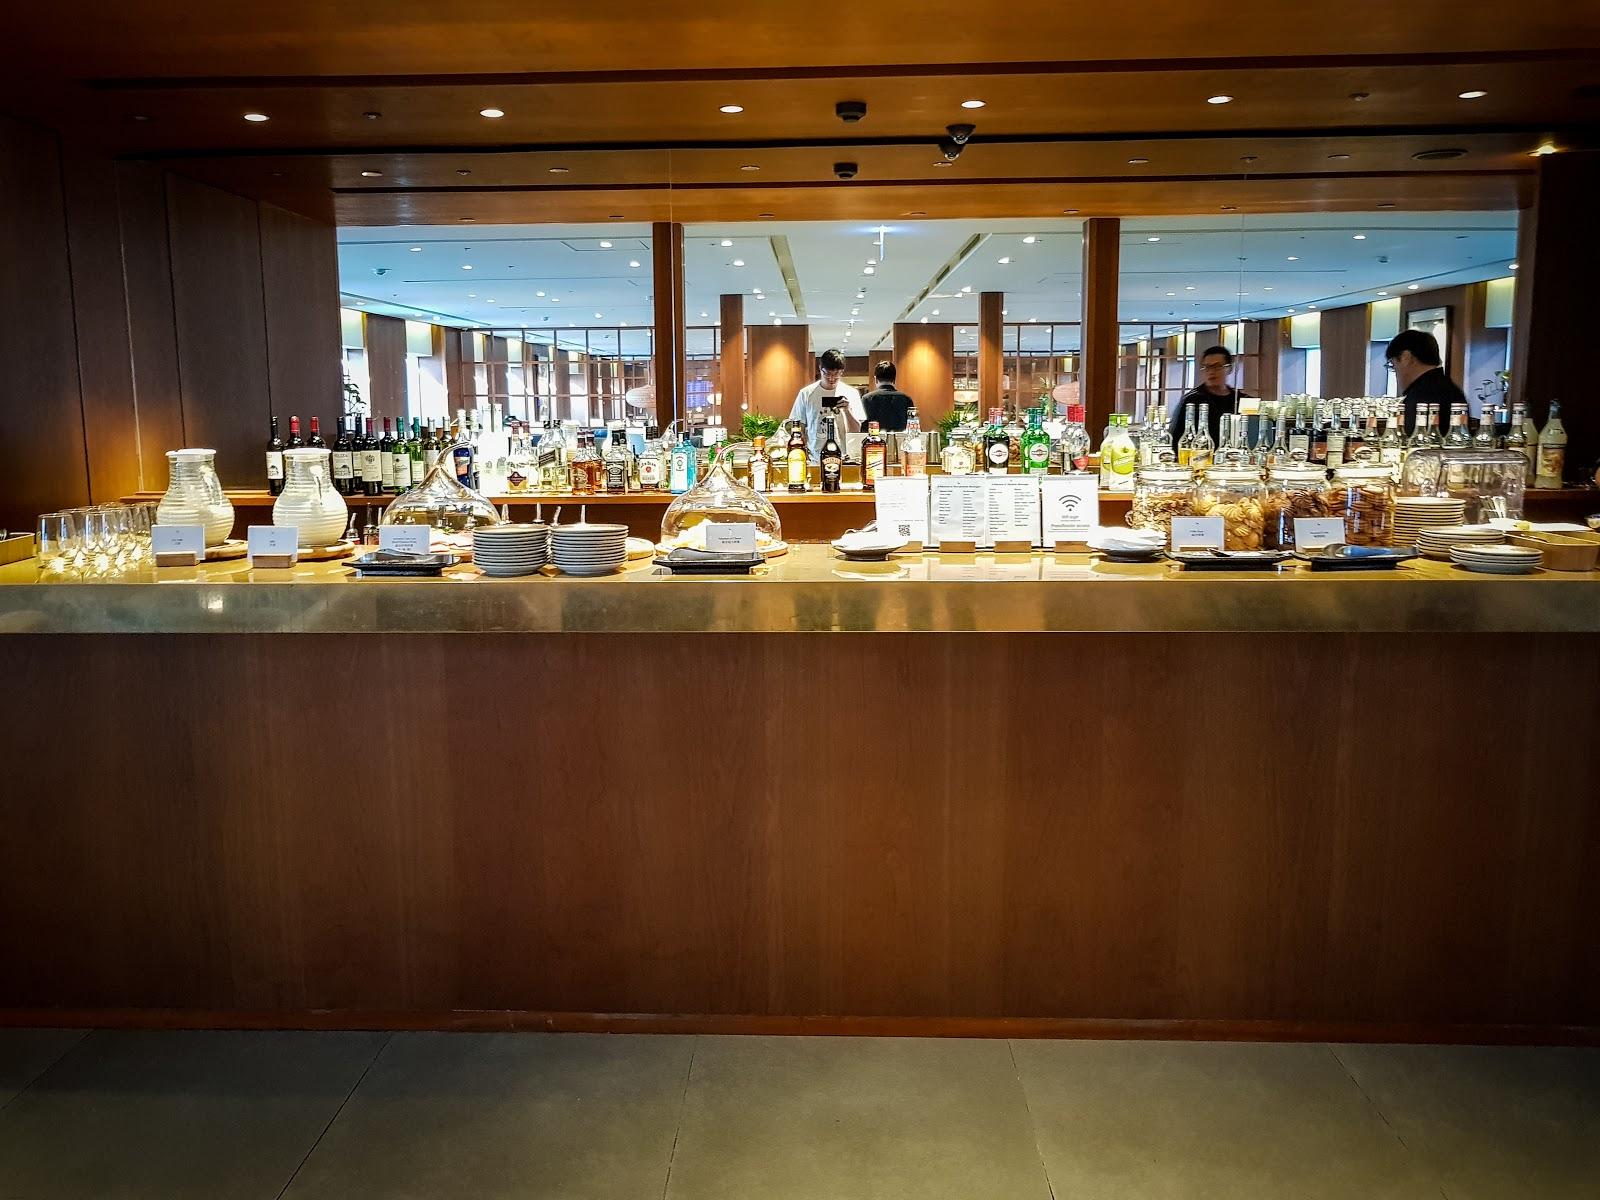 TPE|桃園機場 國泰航空貴賓室 Cathay Pacific Lounge